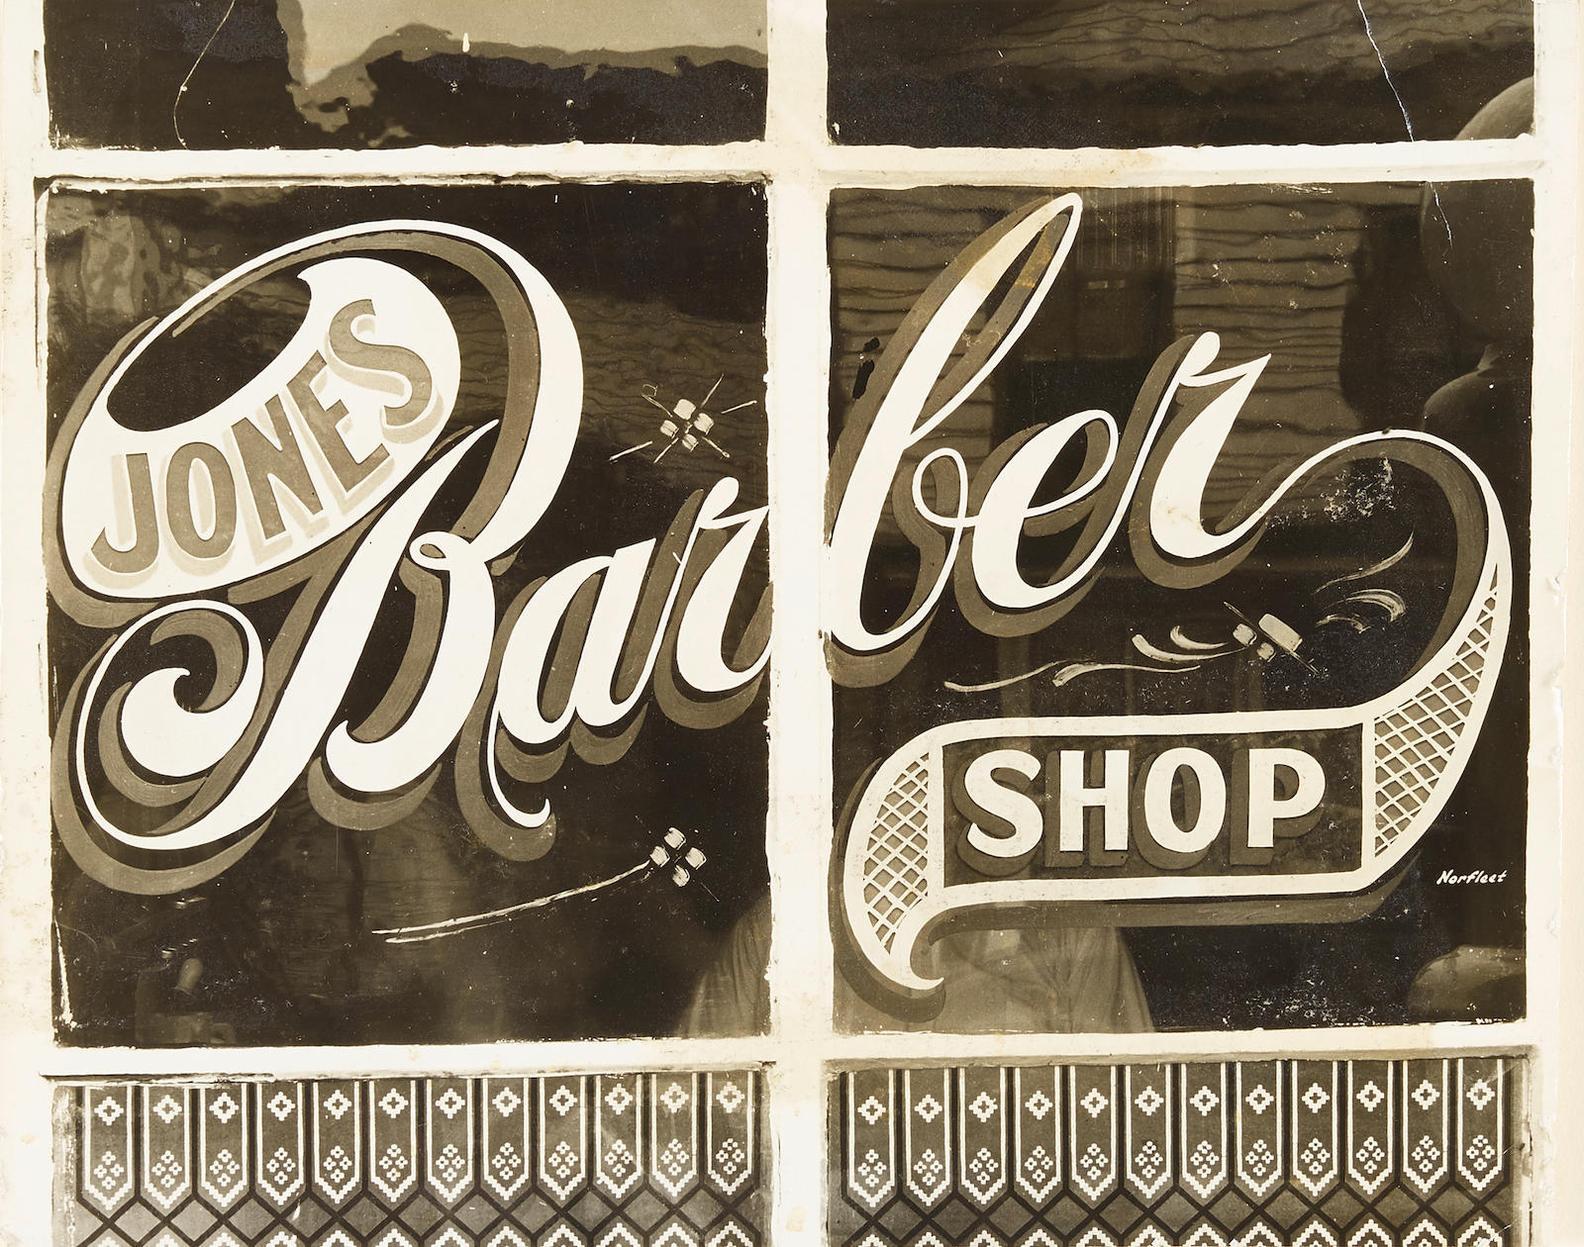 Peter Sekaer - Jones Barber Shop, Bowling Green, Va-1936